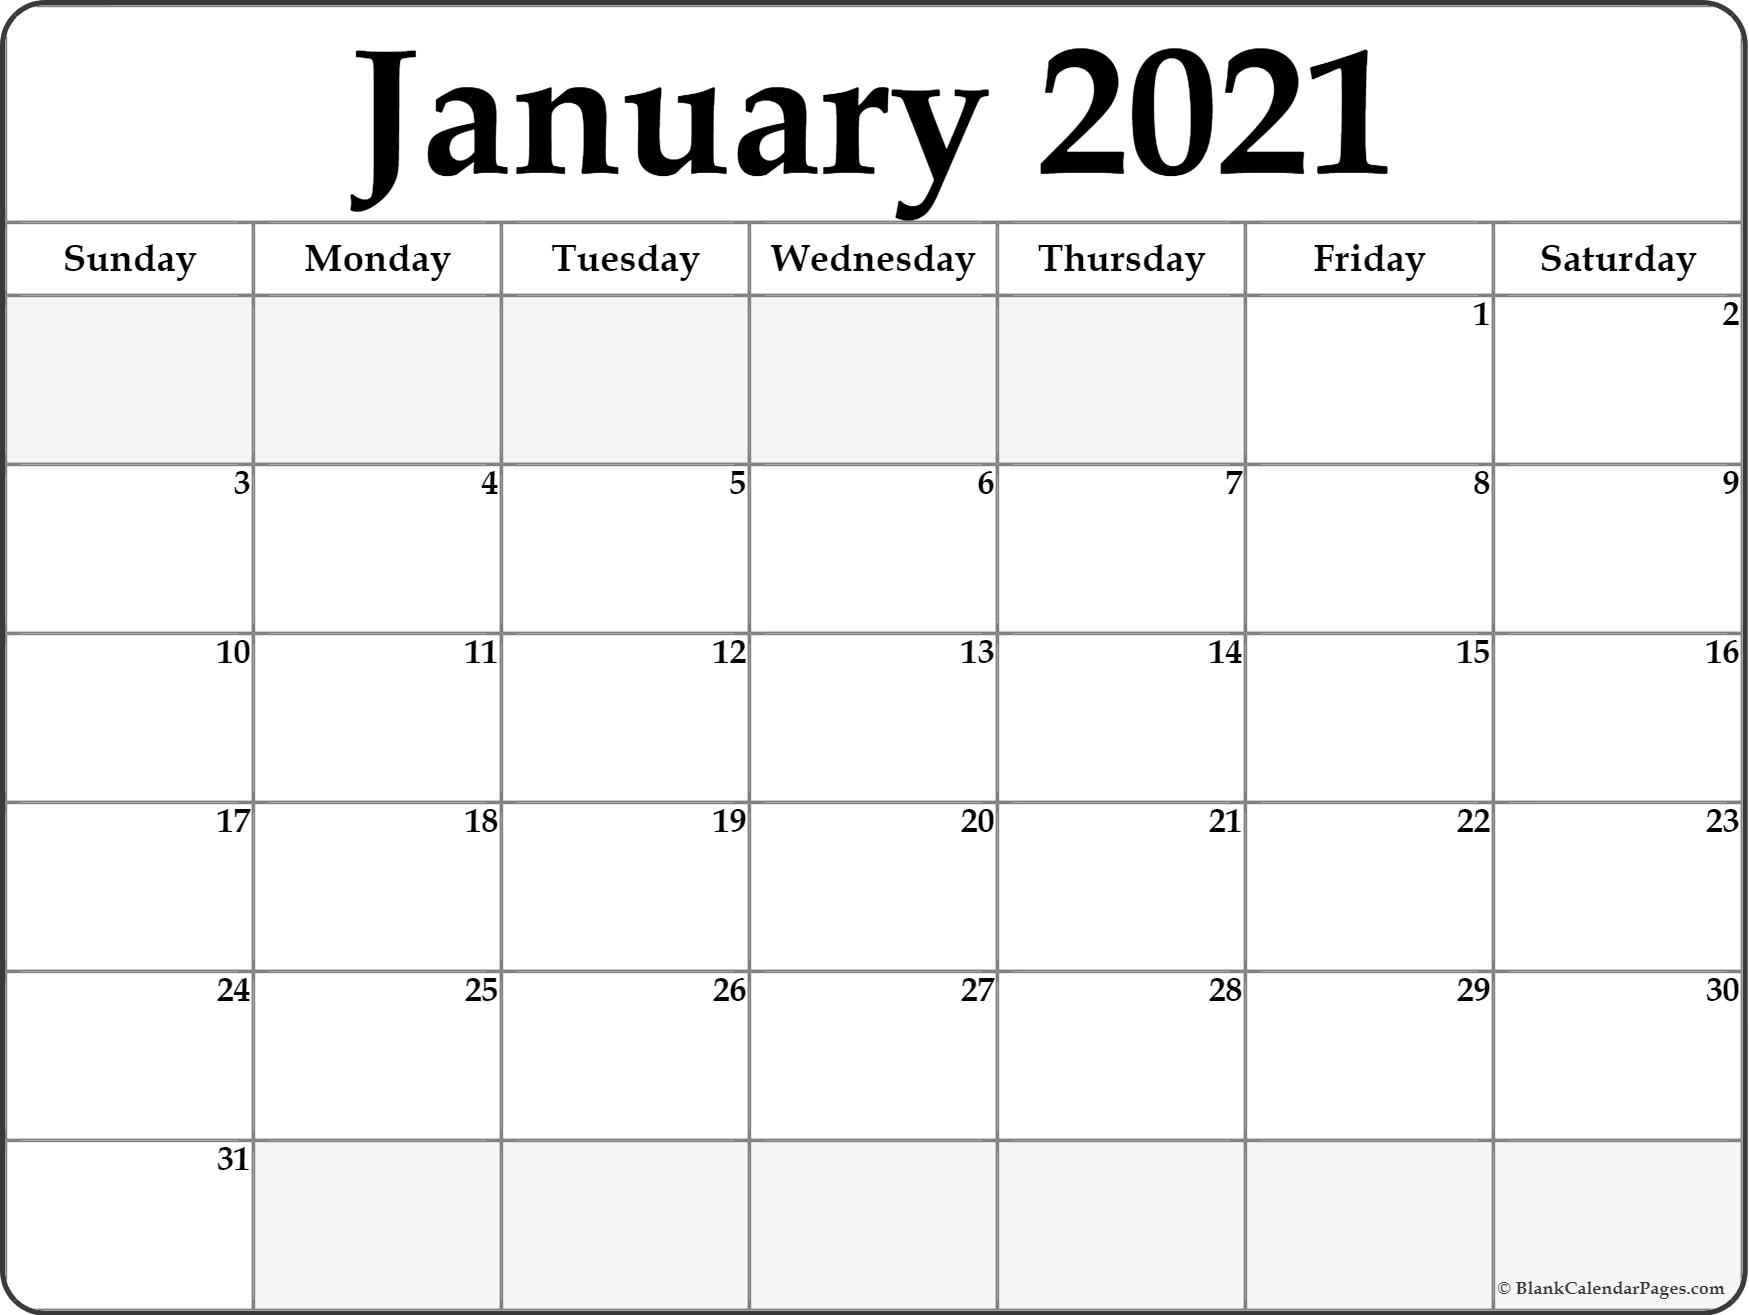 January 2021 Blank Calendar Collection 4